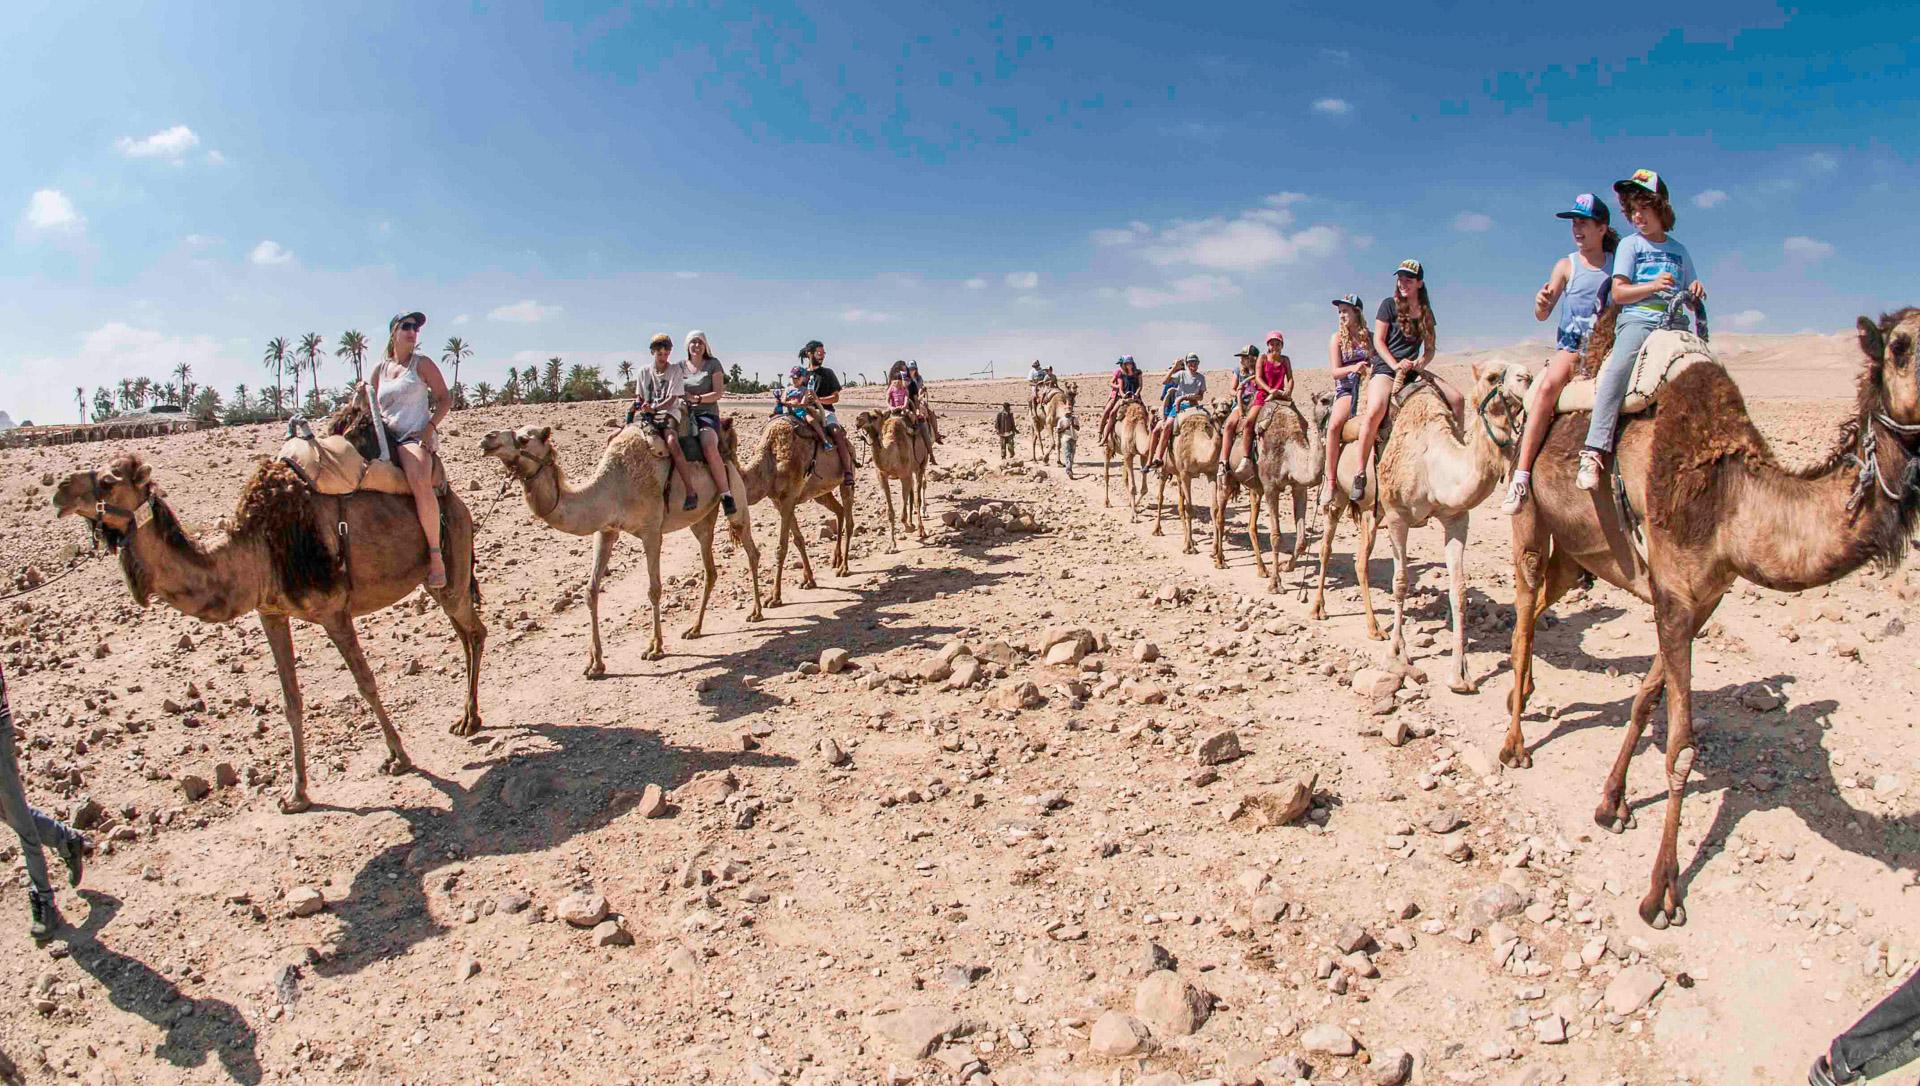 Taking a walk on a camel's back in the Judean Desert adjacent to Arad. (Courtesy Kfar Hanokdim)